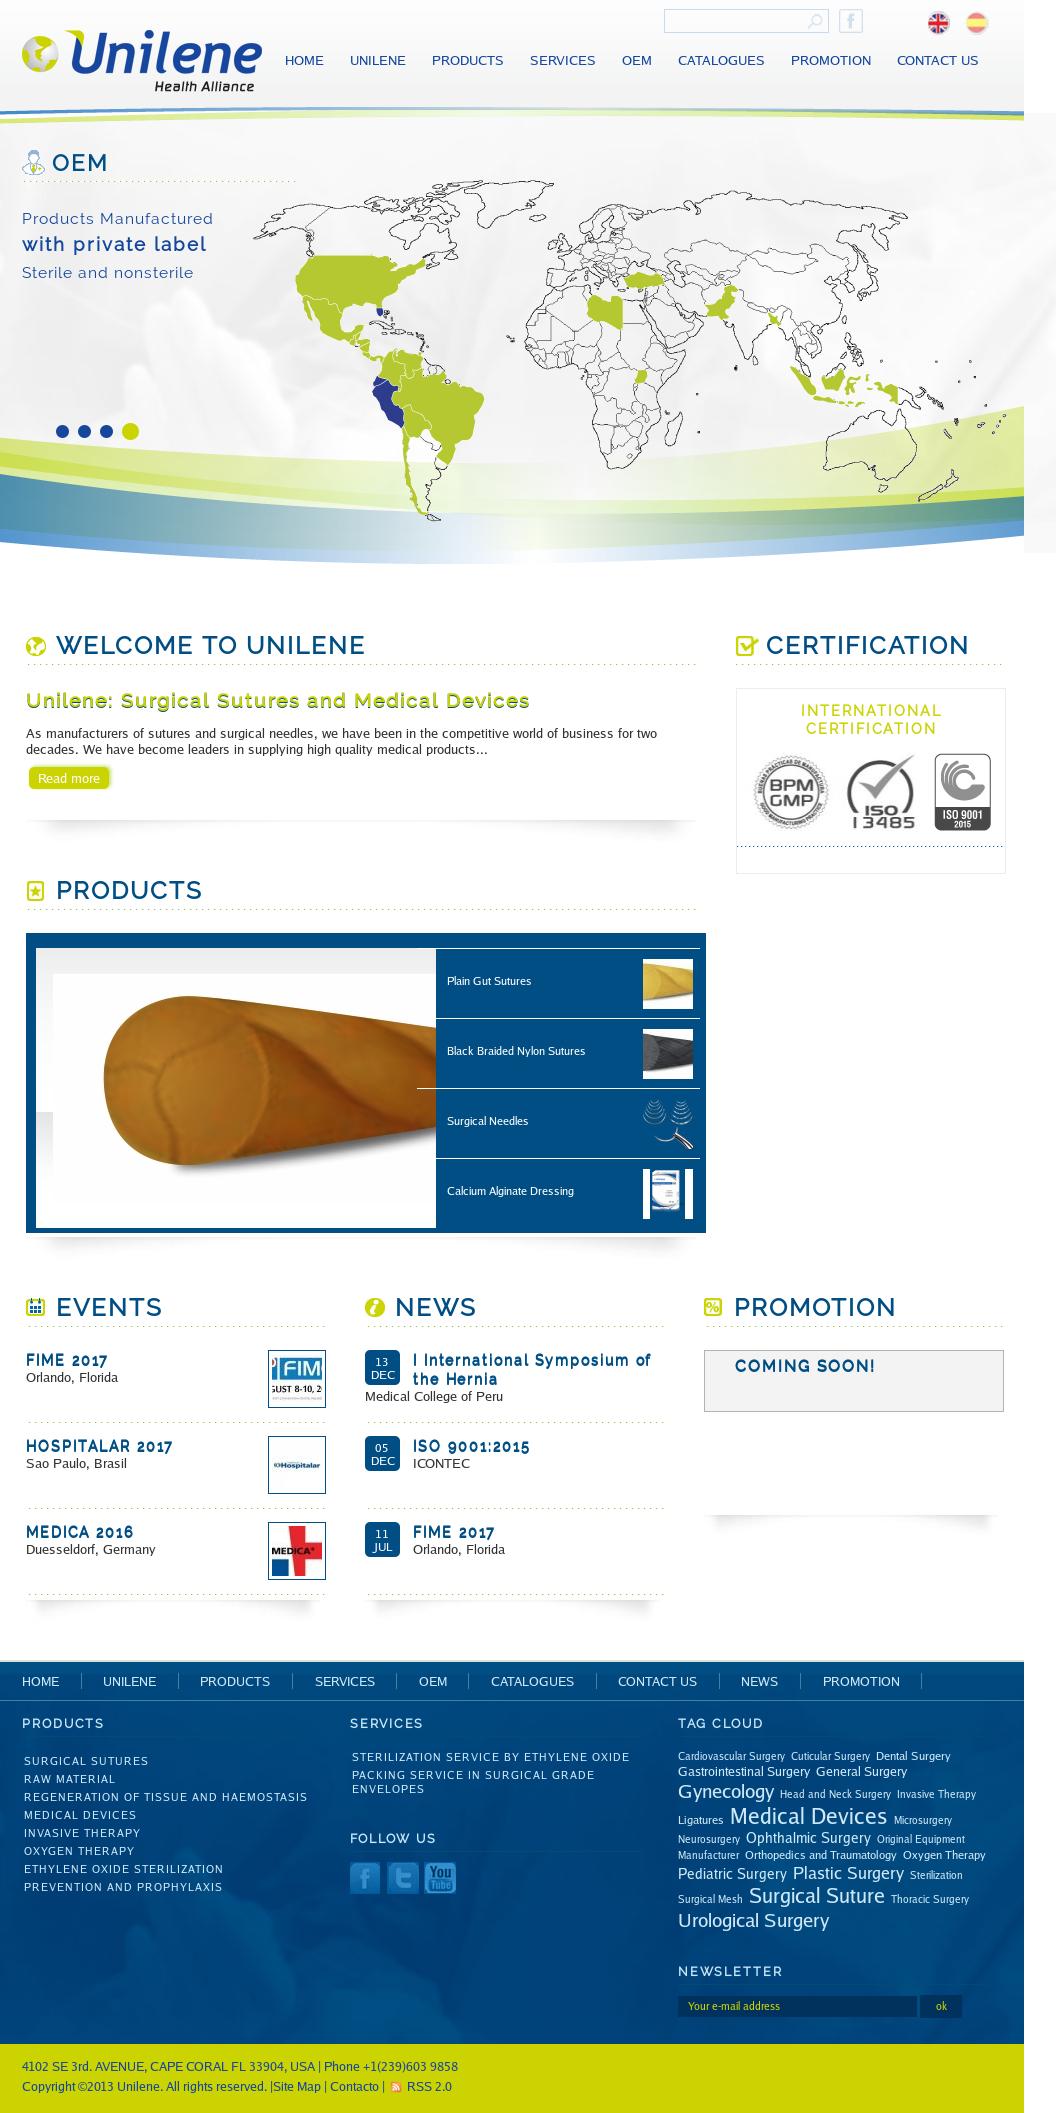 Unilene Competitors, Revenue and Employees - Owler Company